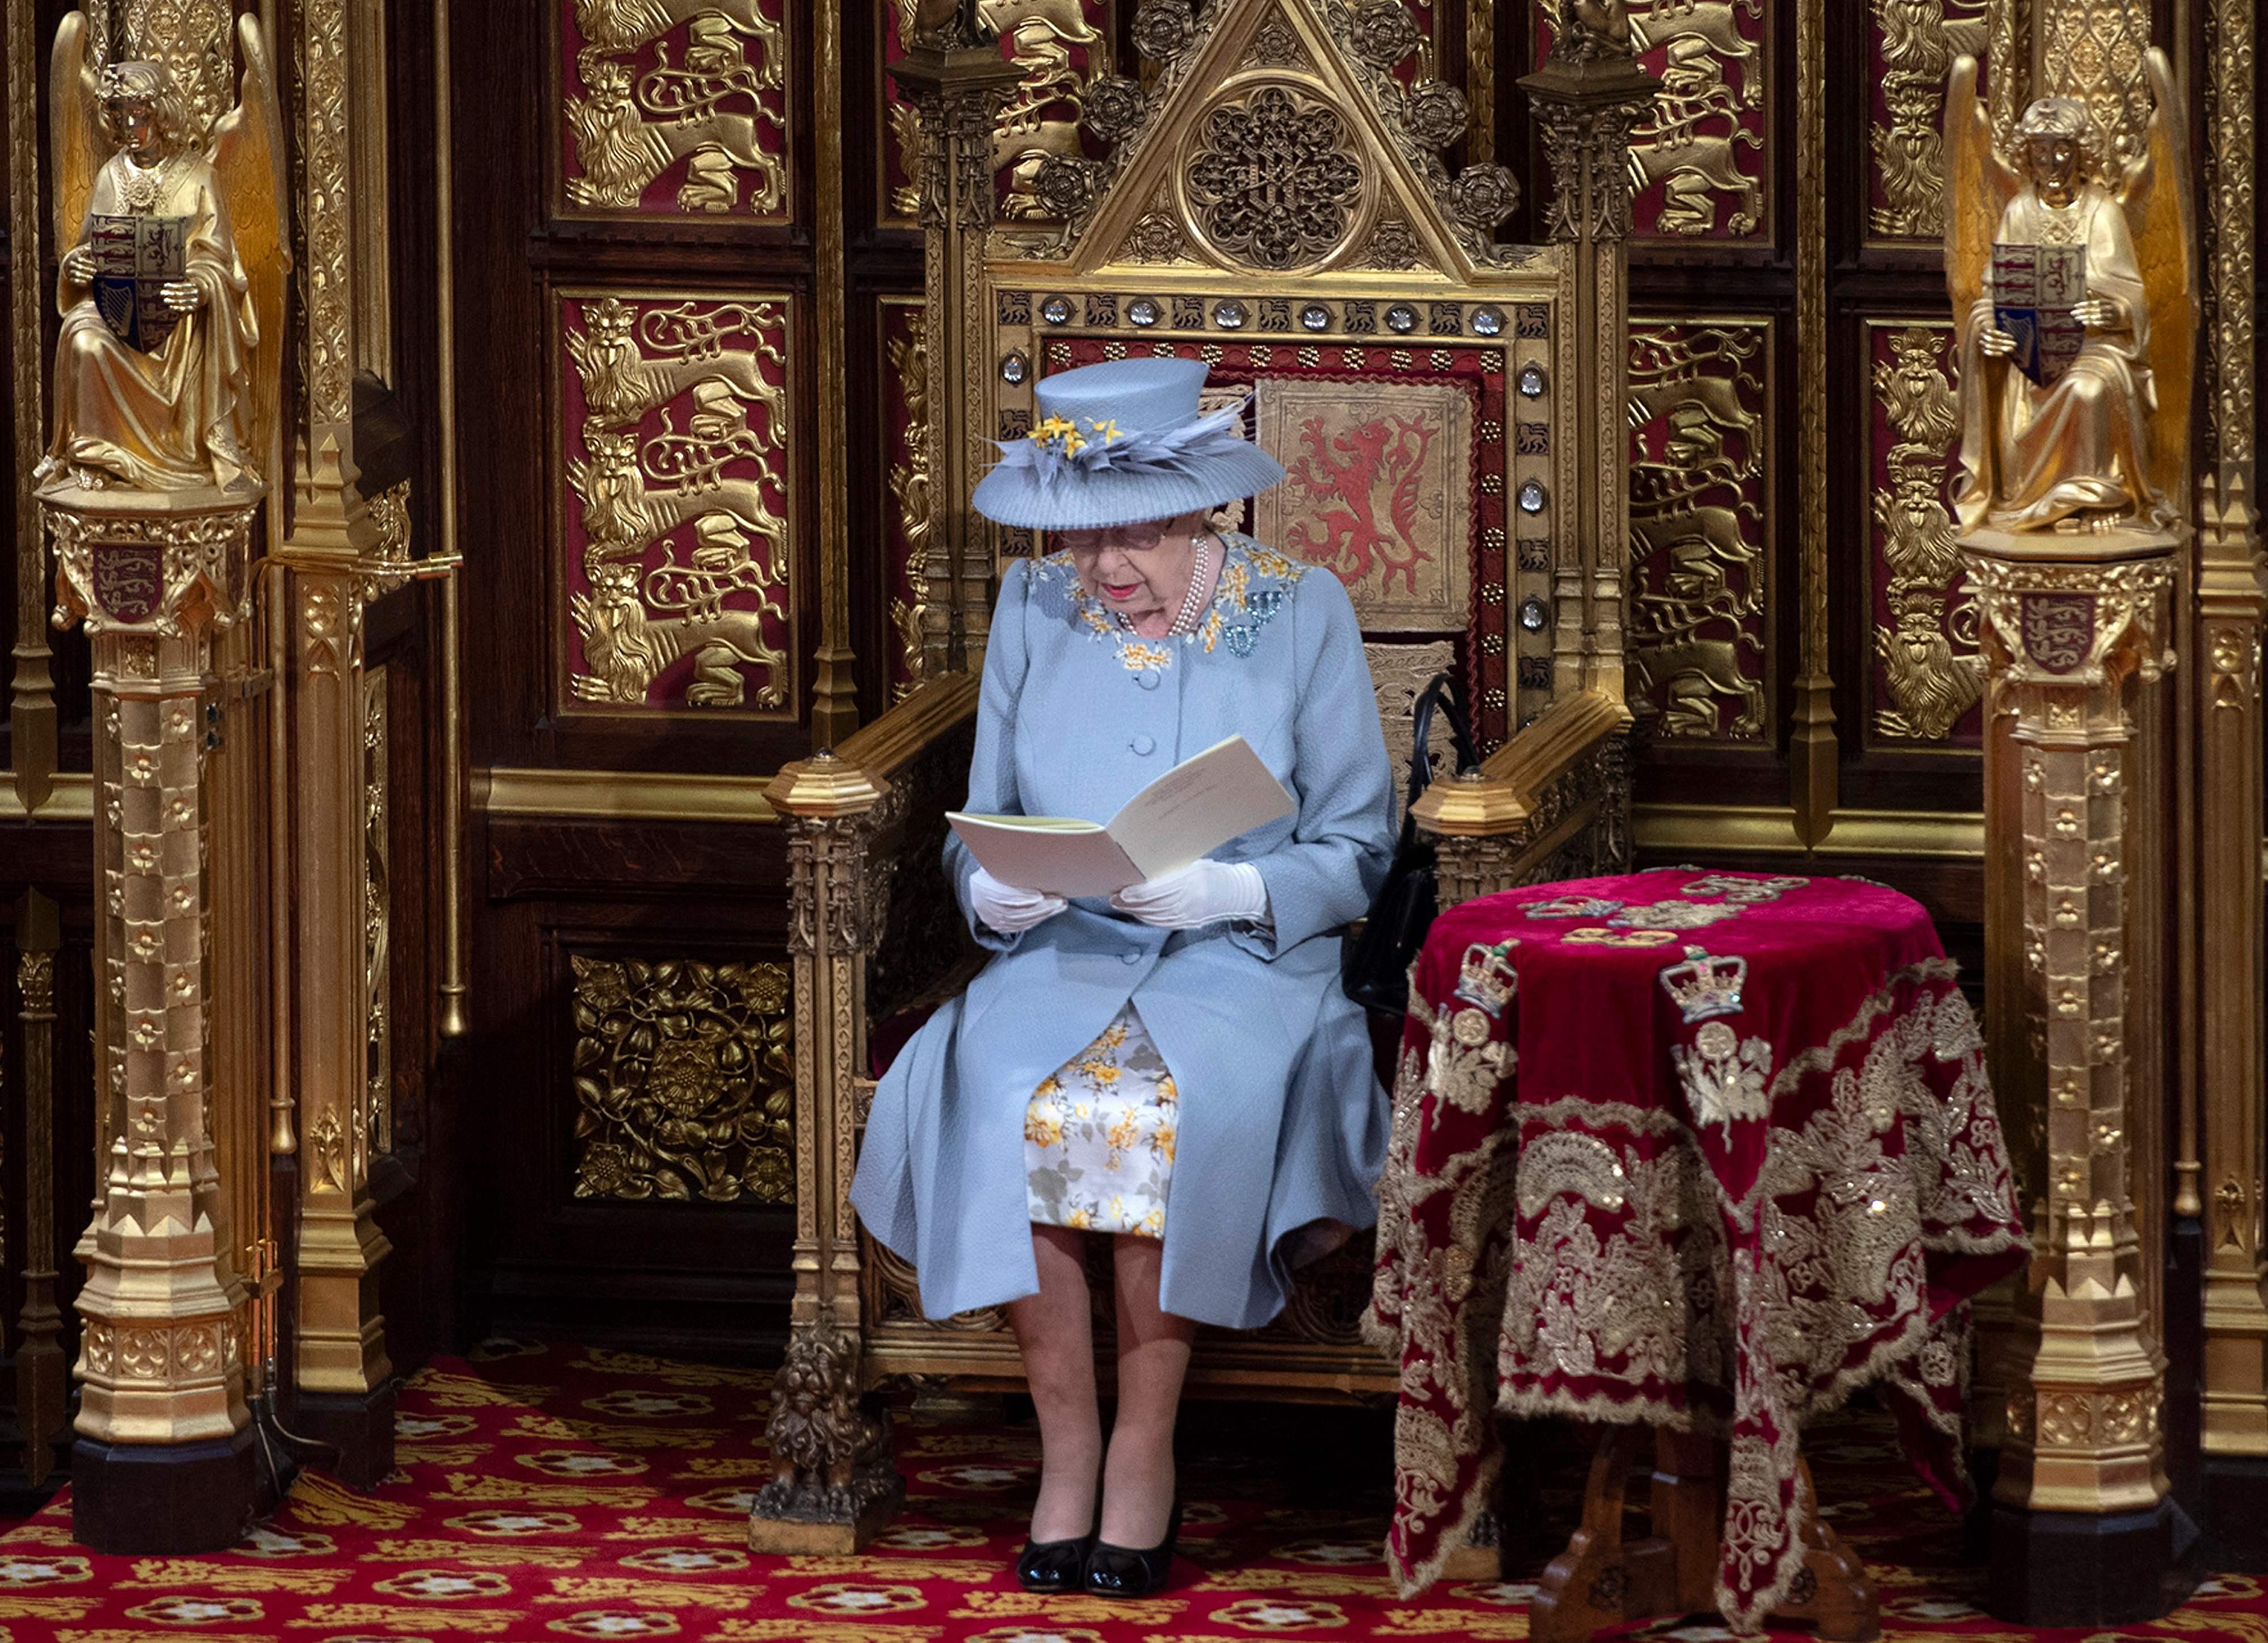 Queen Elizabeth opens Parliament, first duty since Prince Philip death